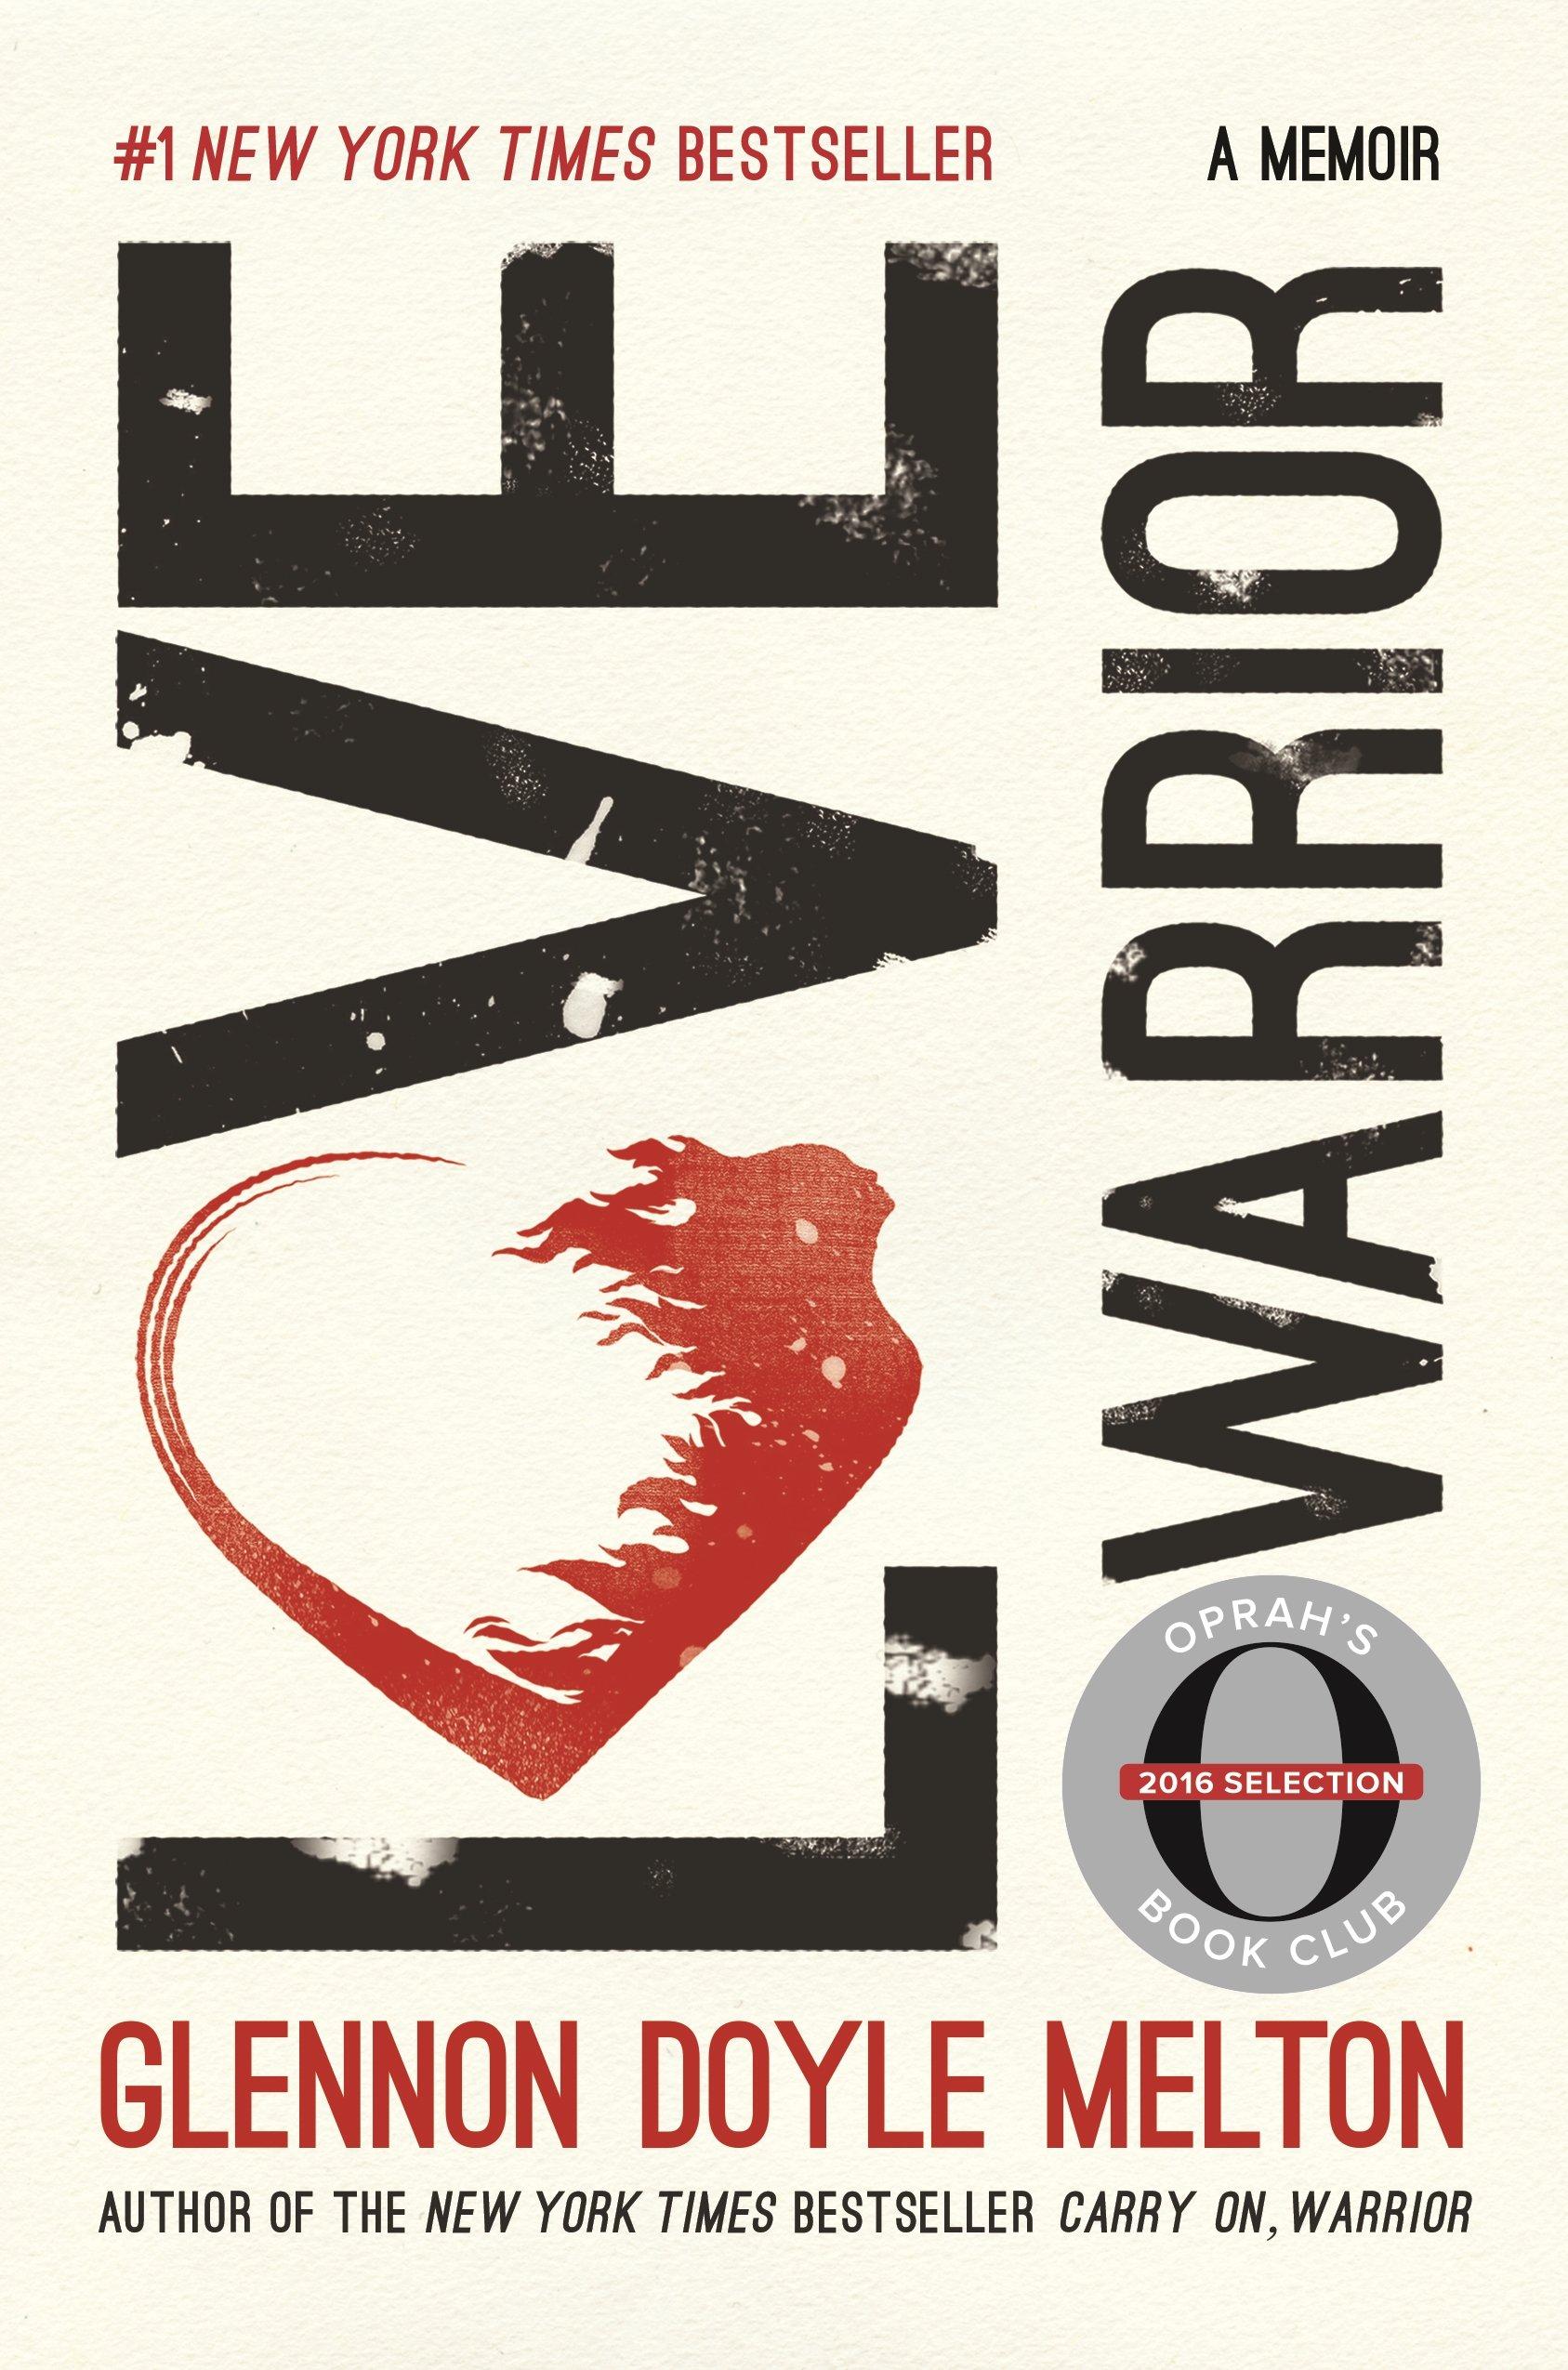 Love Warrior: A Memoir  by Glennon Doyle Melton